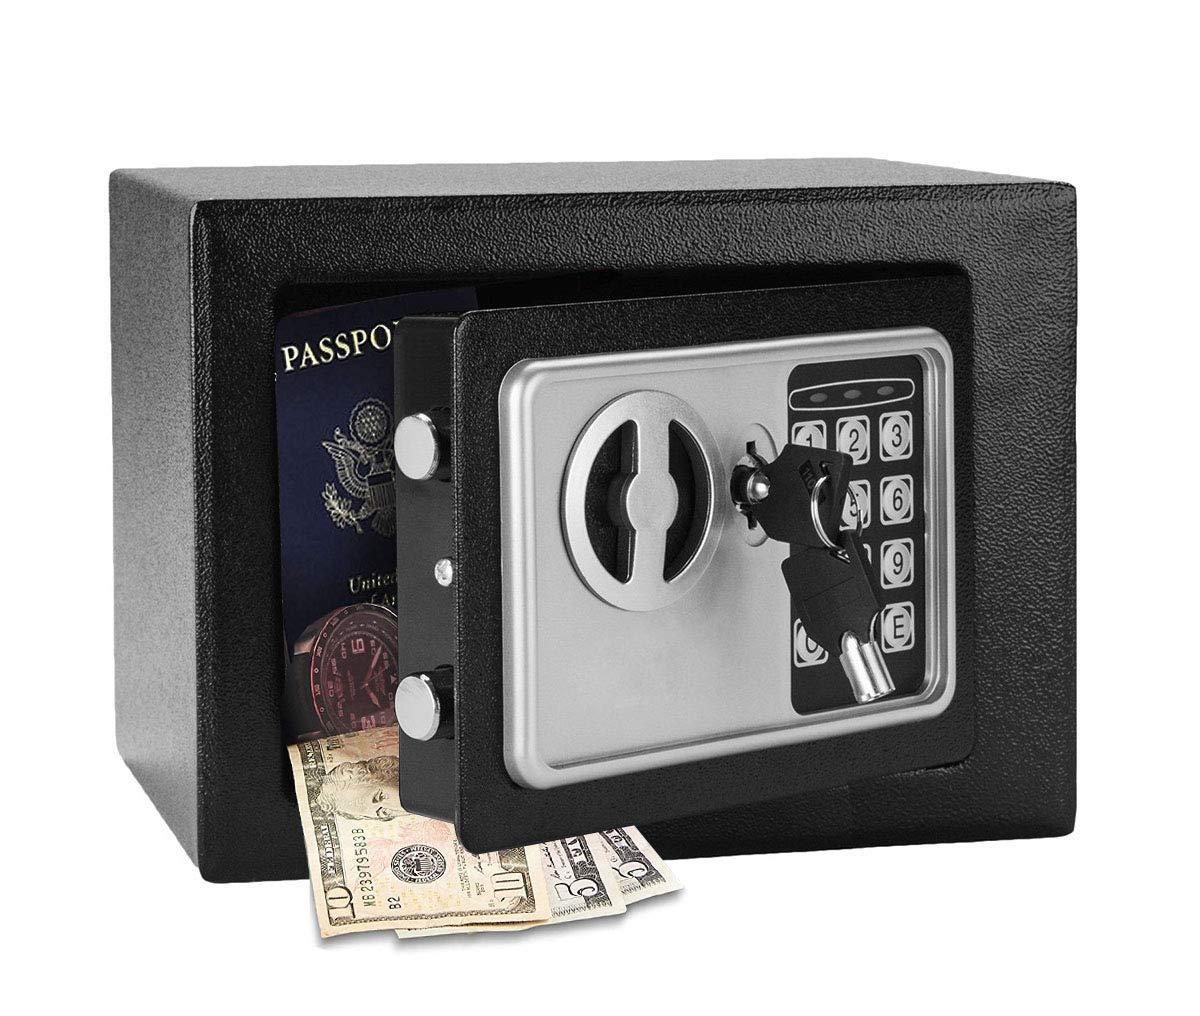 Mini Safe Box, Electronic Digital Security Wall Safes with 2 Keys (Mini Safe)